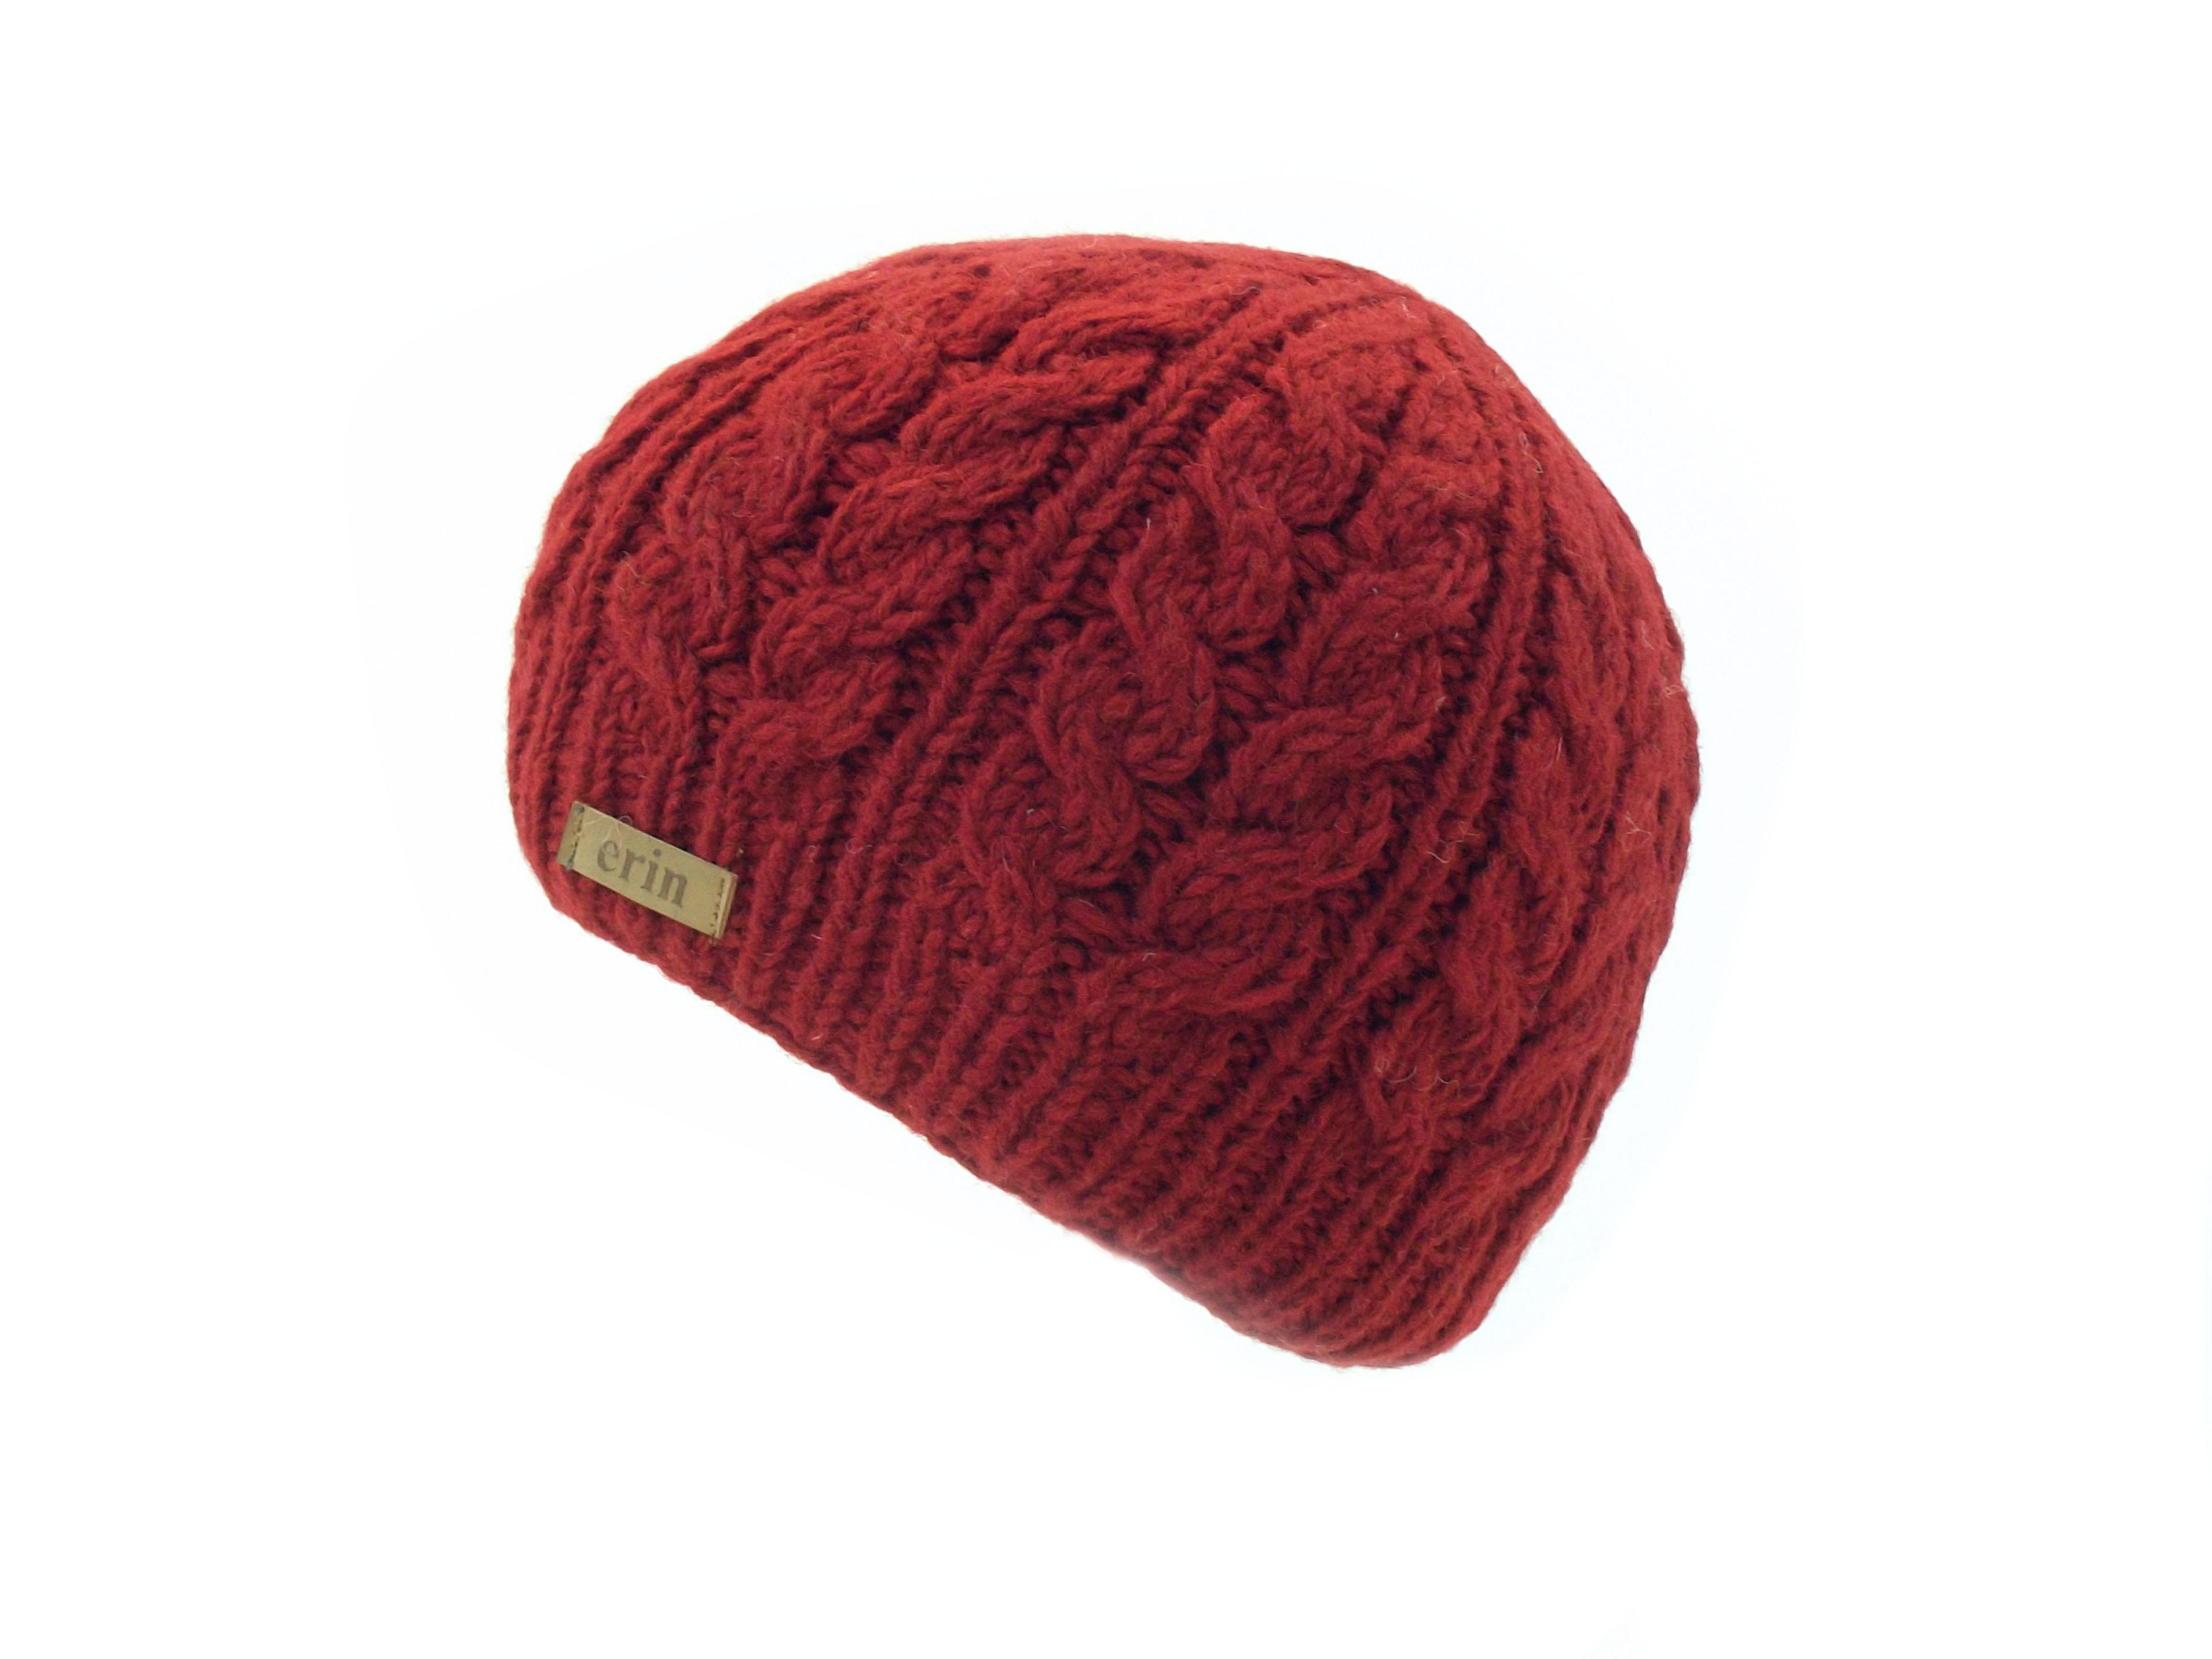 ca2250f48 Aran Cable Pullon Hat Red